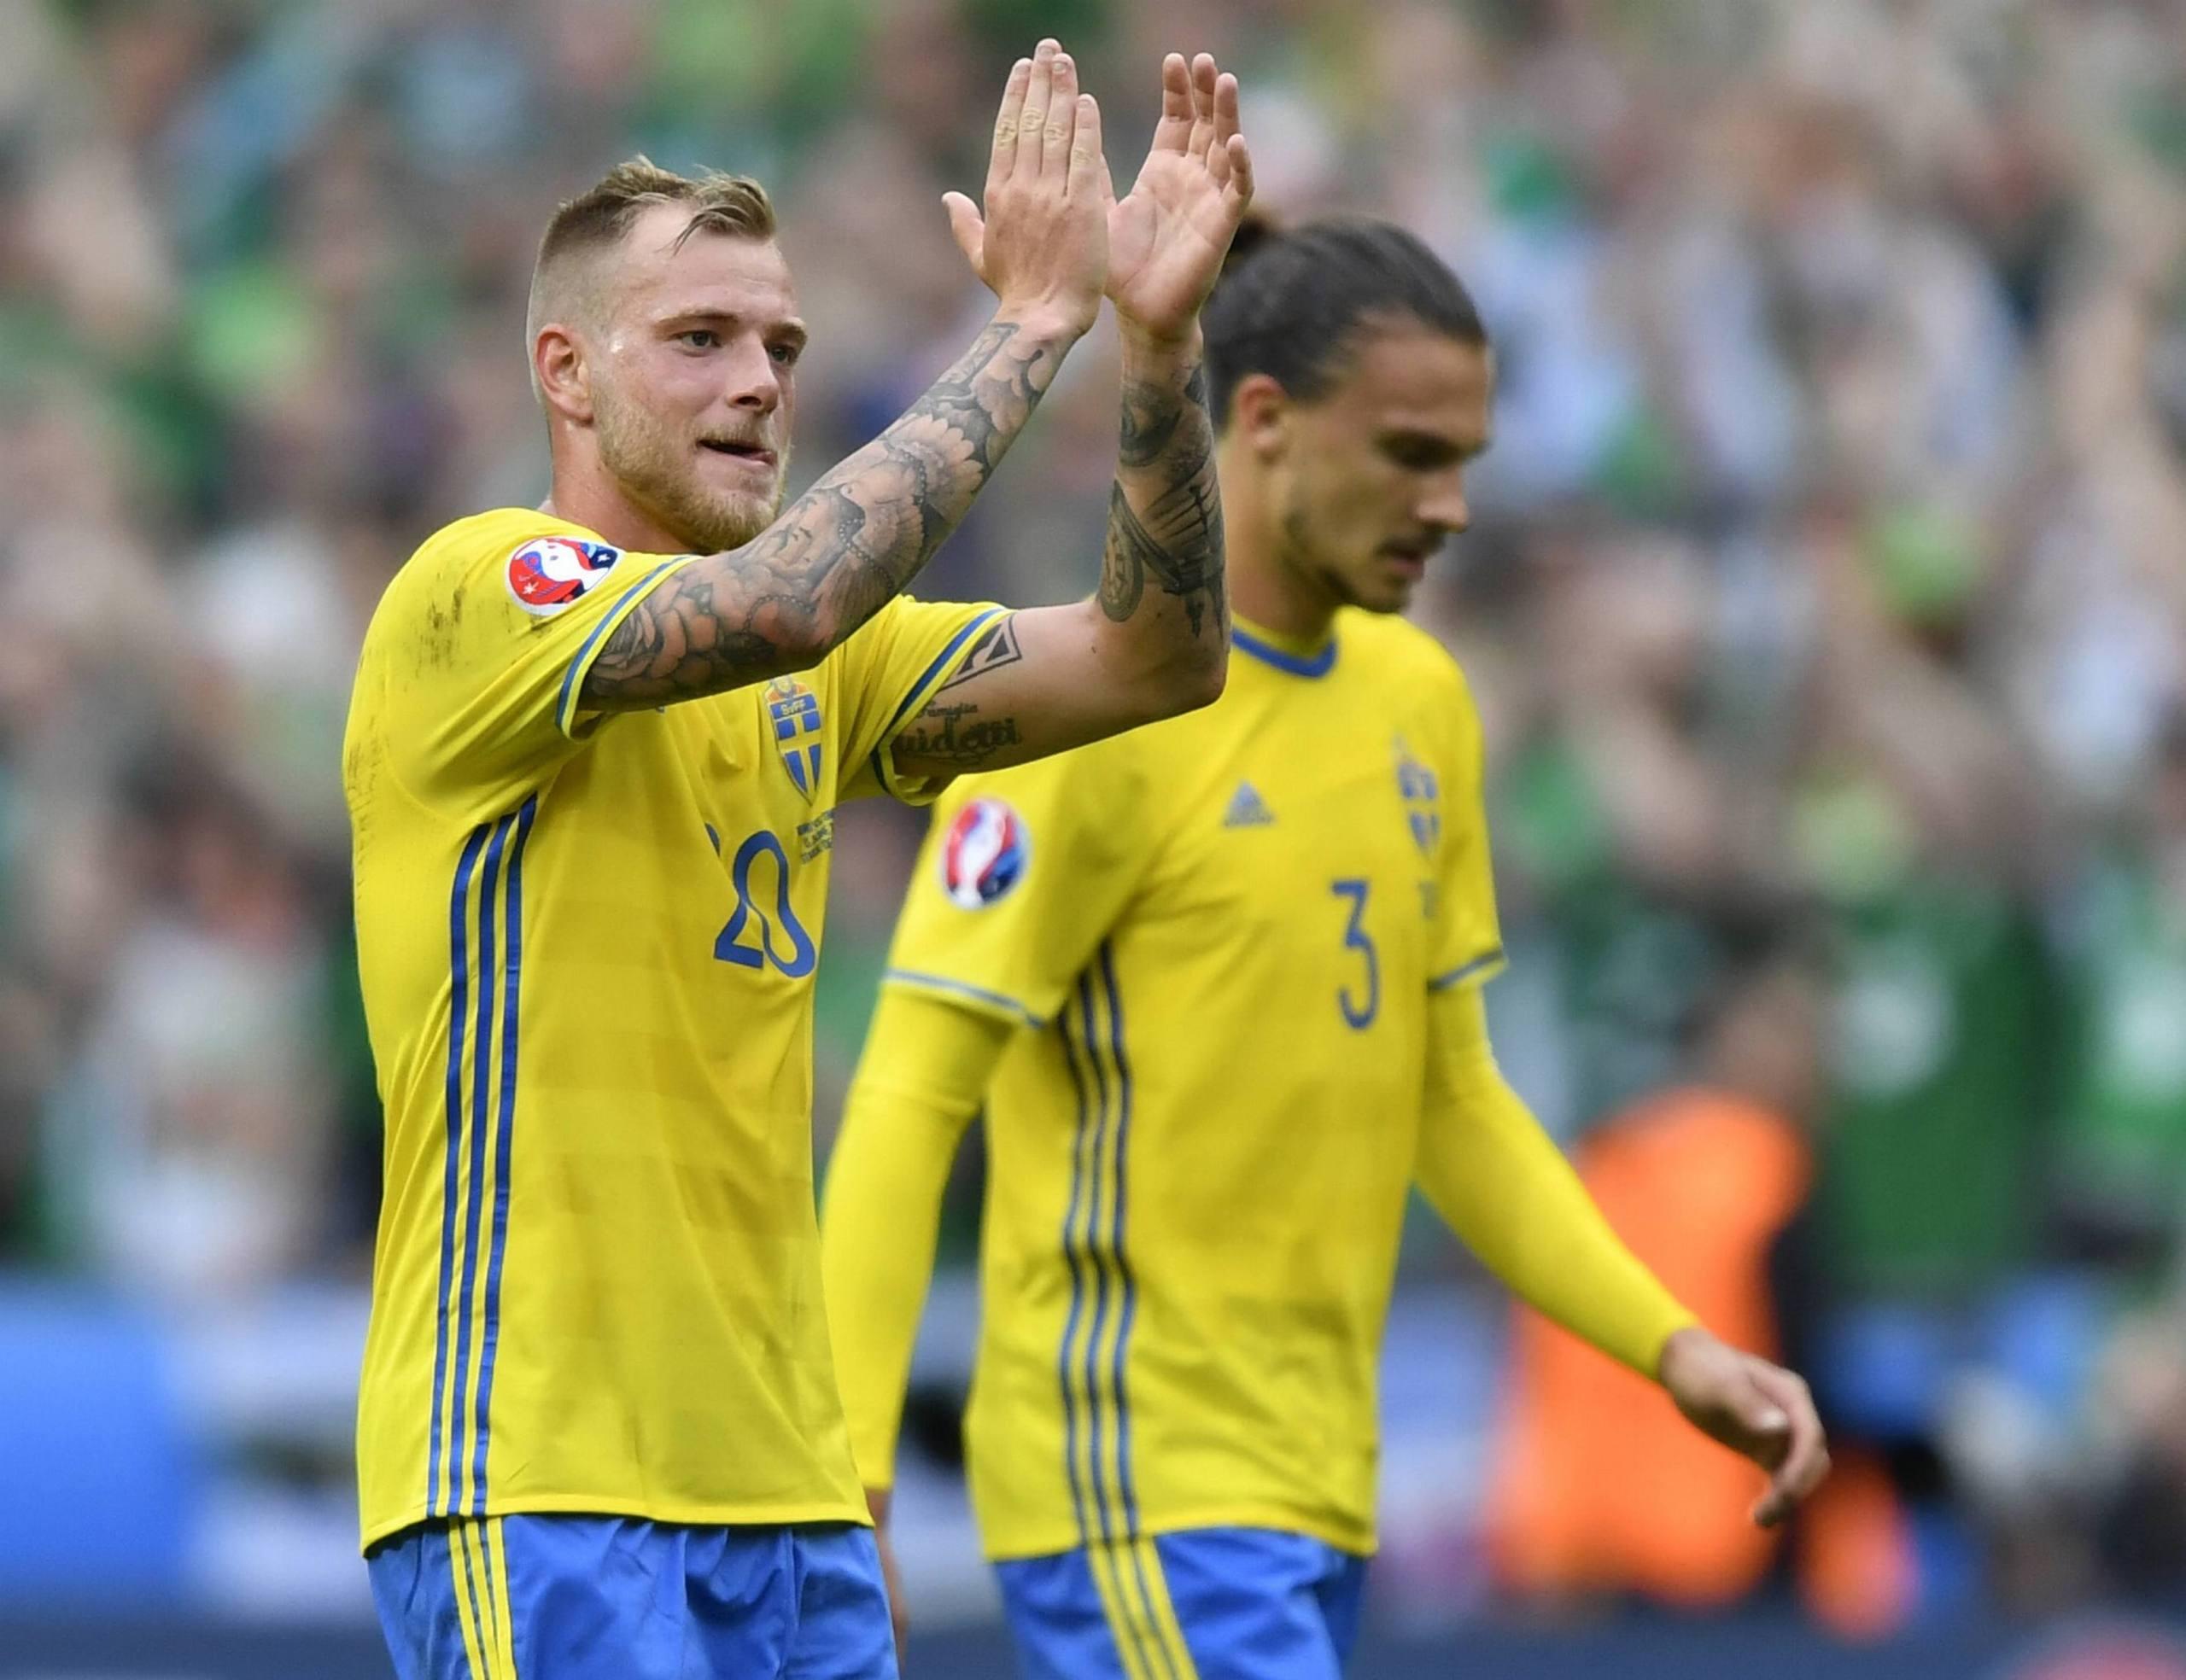 Ericsson vill spela nej fran zata